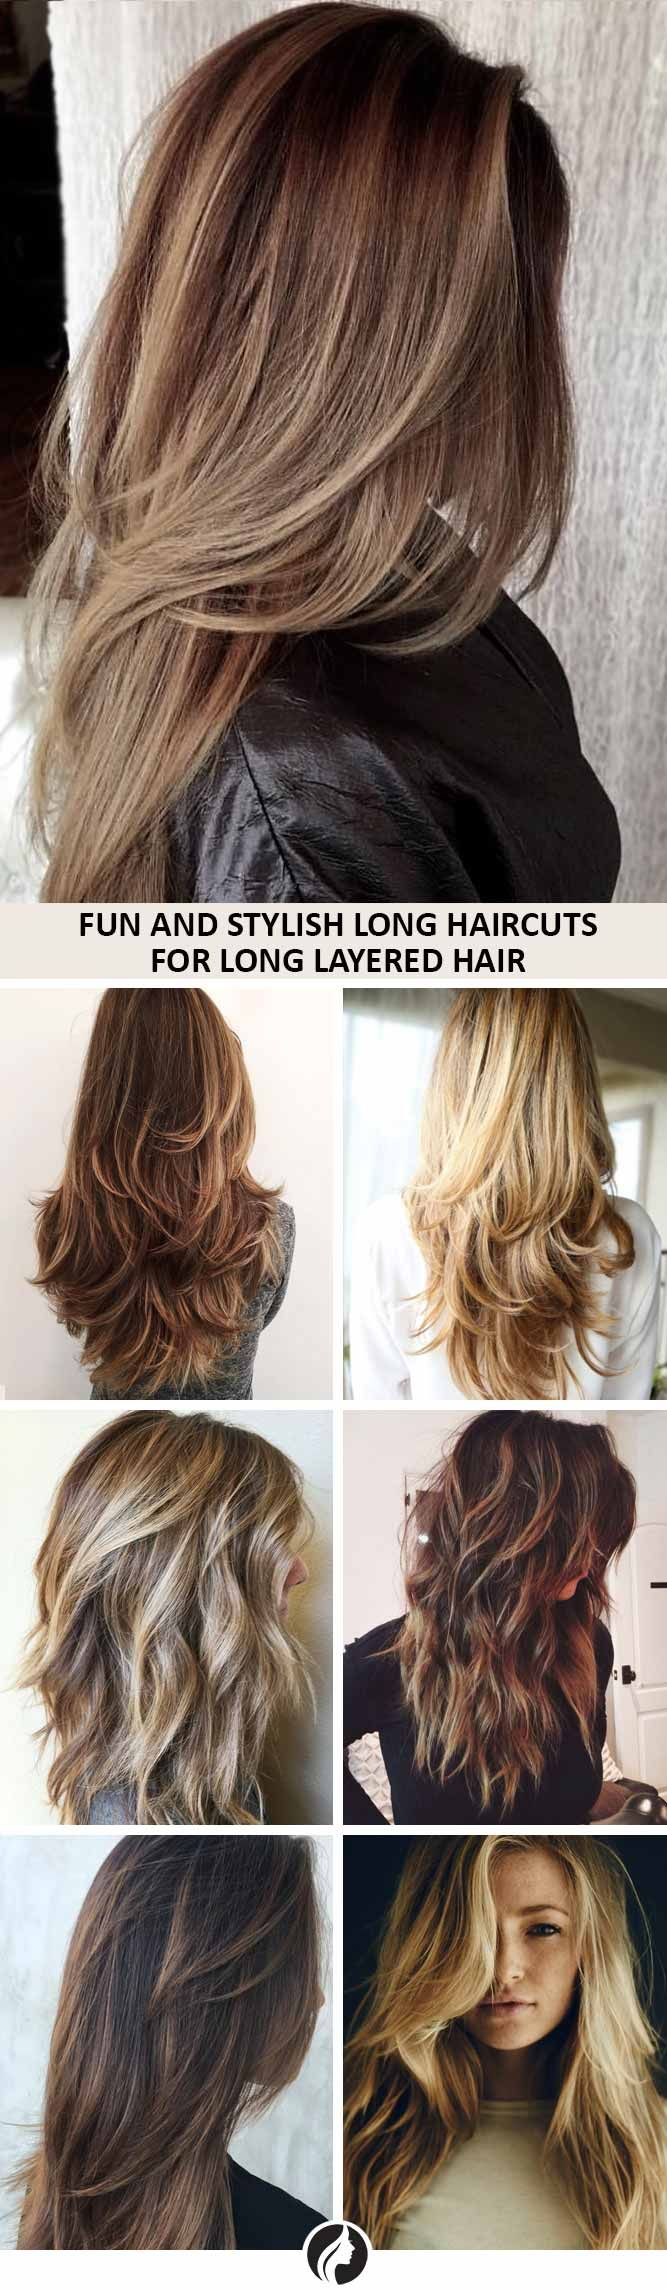 Fun and Stylish Long Haircuts for Long Layered Hair